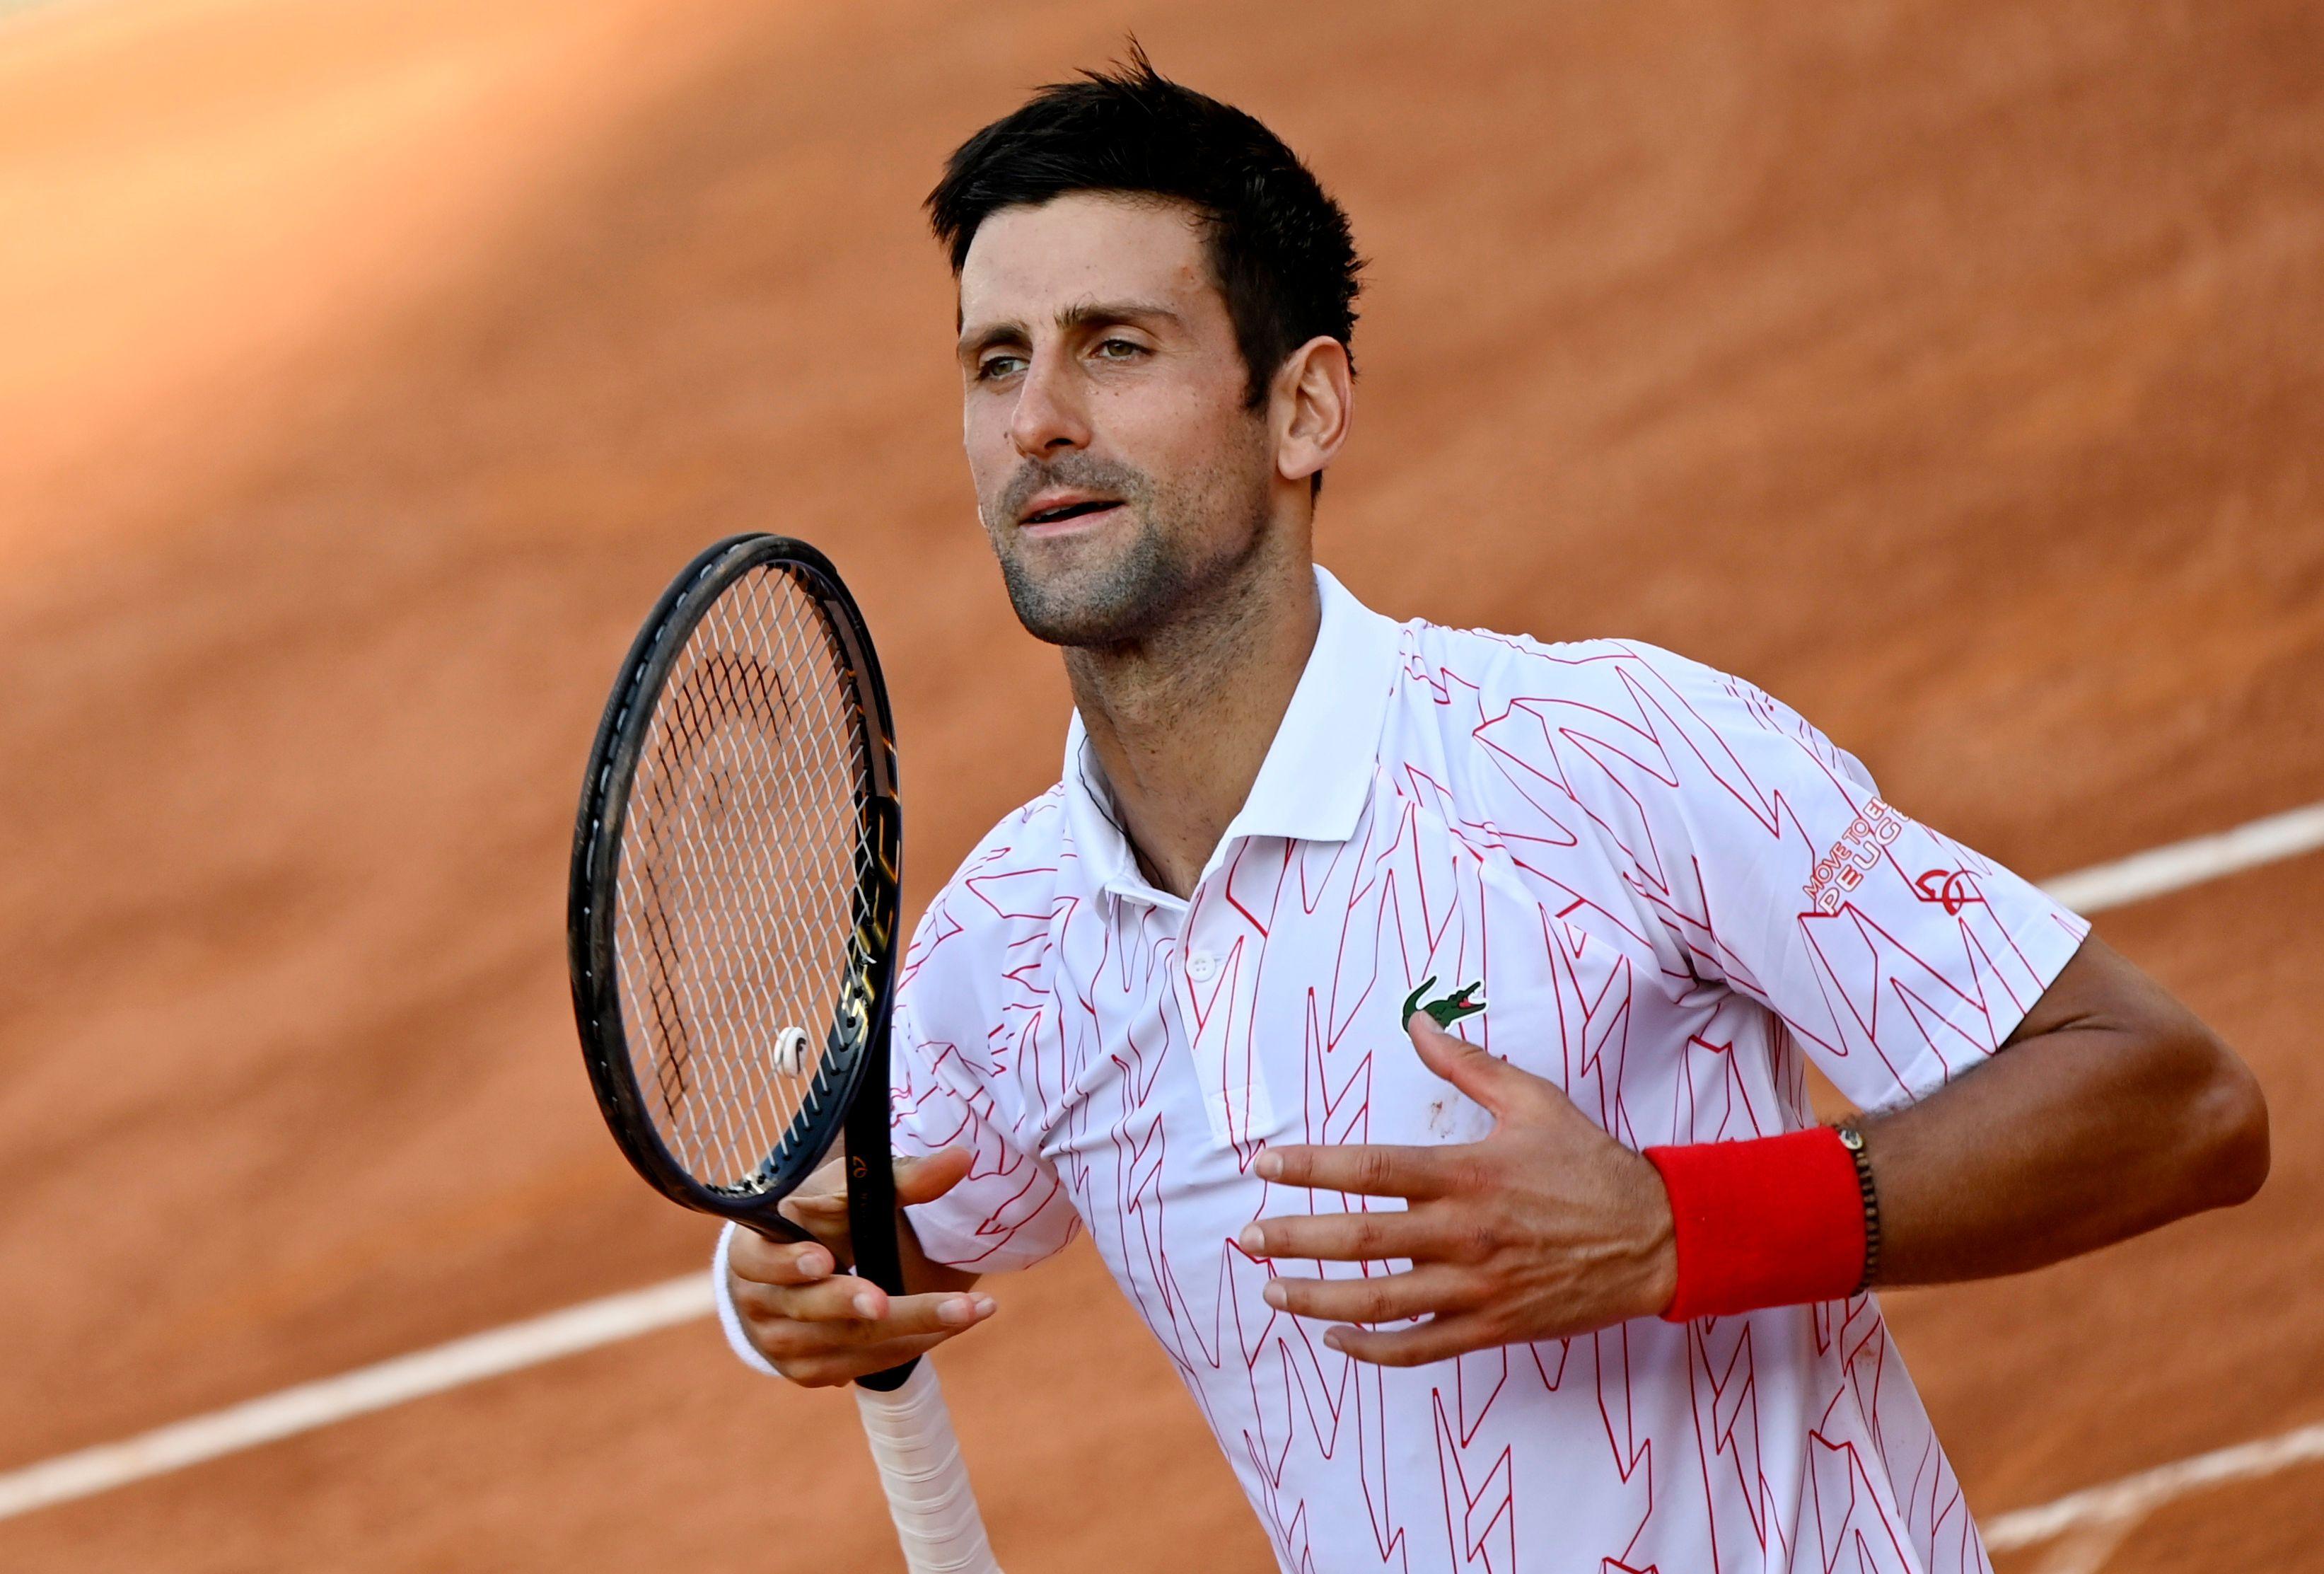 Serbia's Novak Djokovic celebrates after winning his semi final match against Norway's Casper Ruud. Photo: Reuters